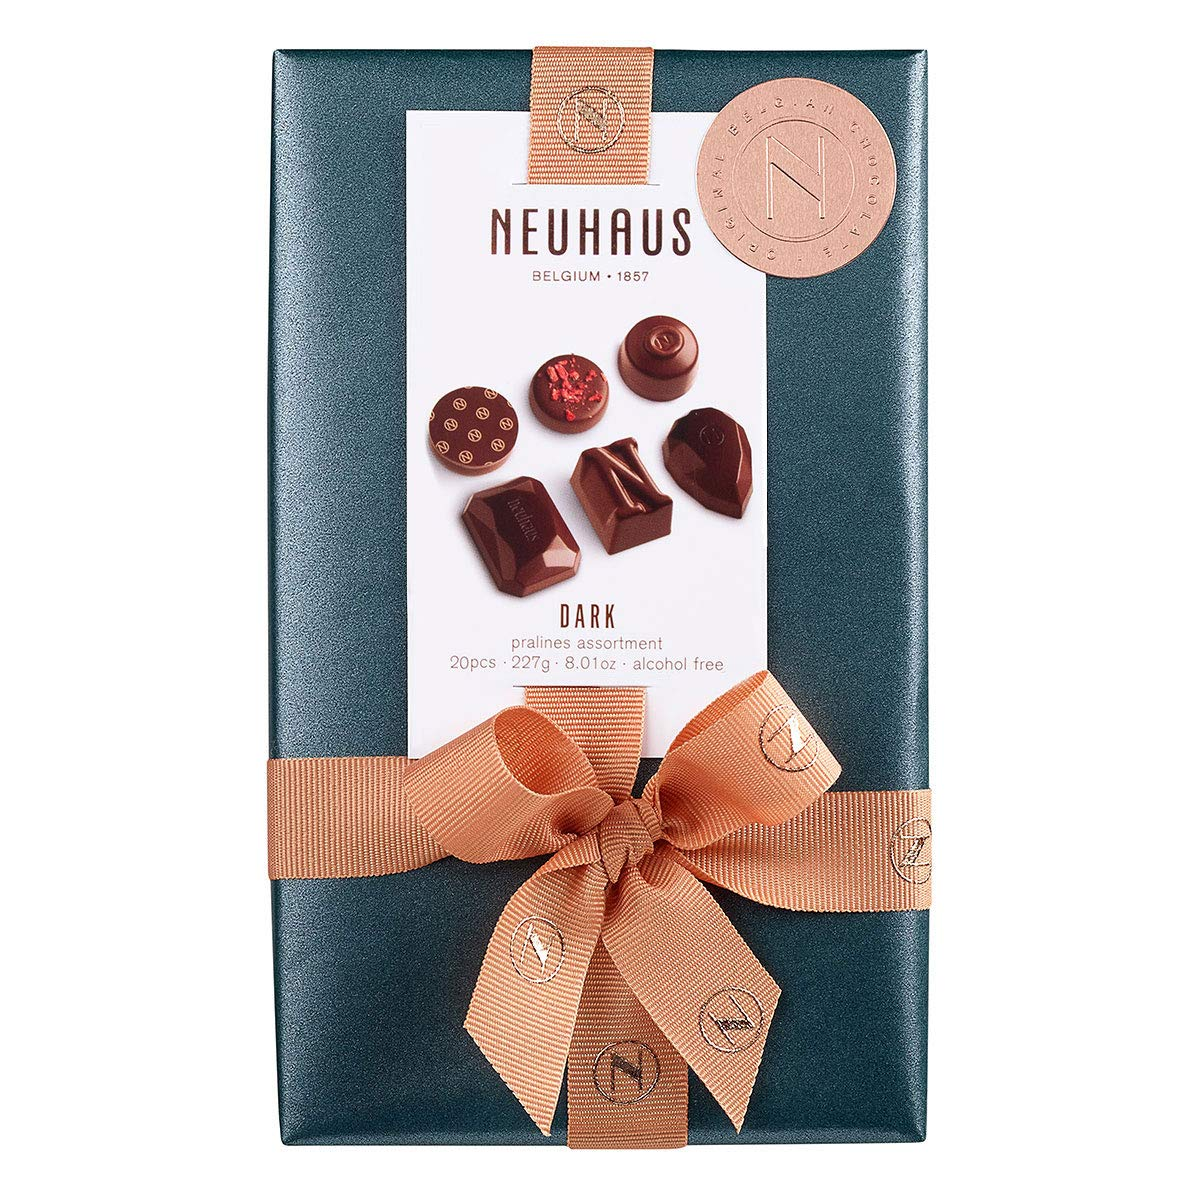 Neuhaus Belgian Dark Chocolate Ballotin (20 pieces) - Gourmet Dark Chocolate Gift Box - 1/2 lb by Neuhaus